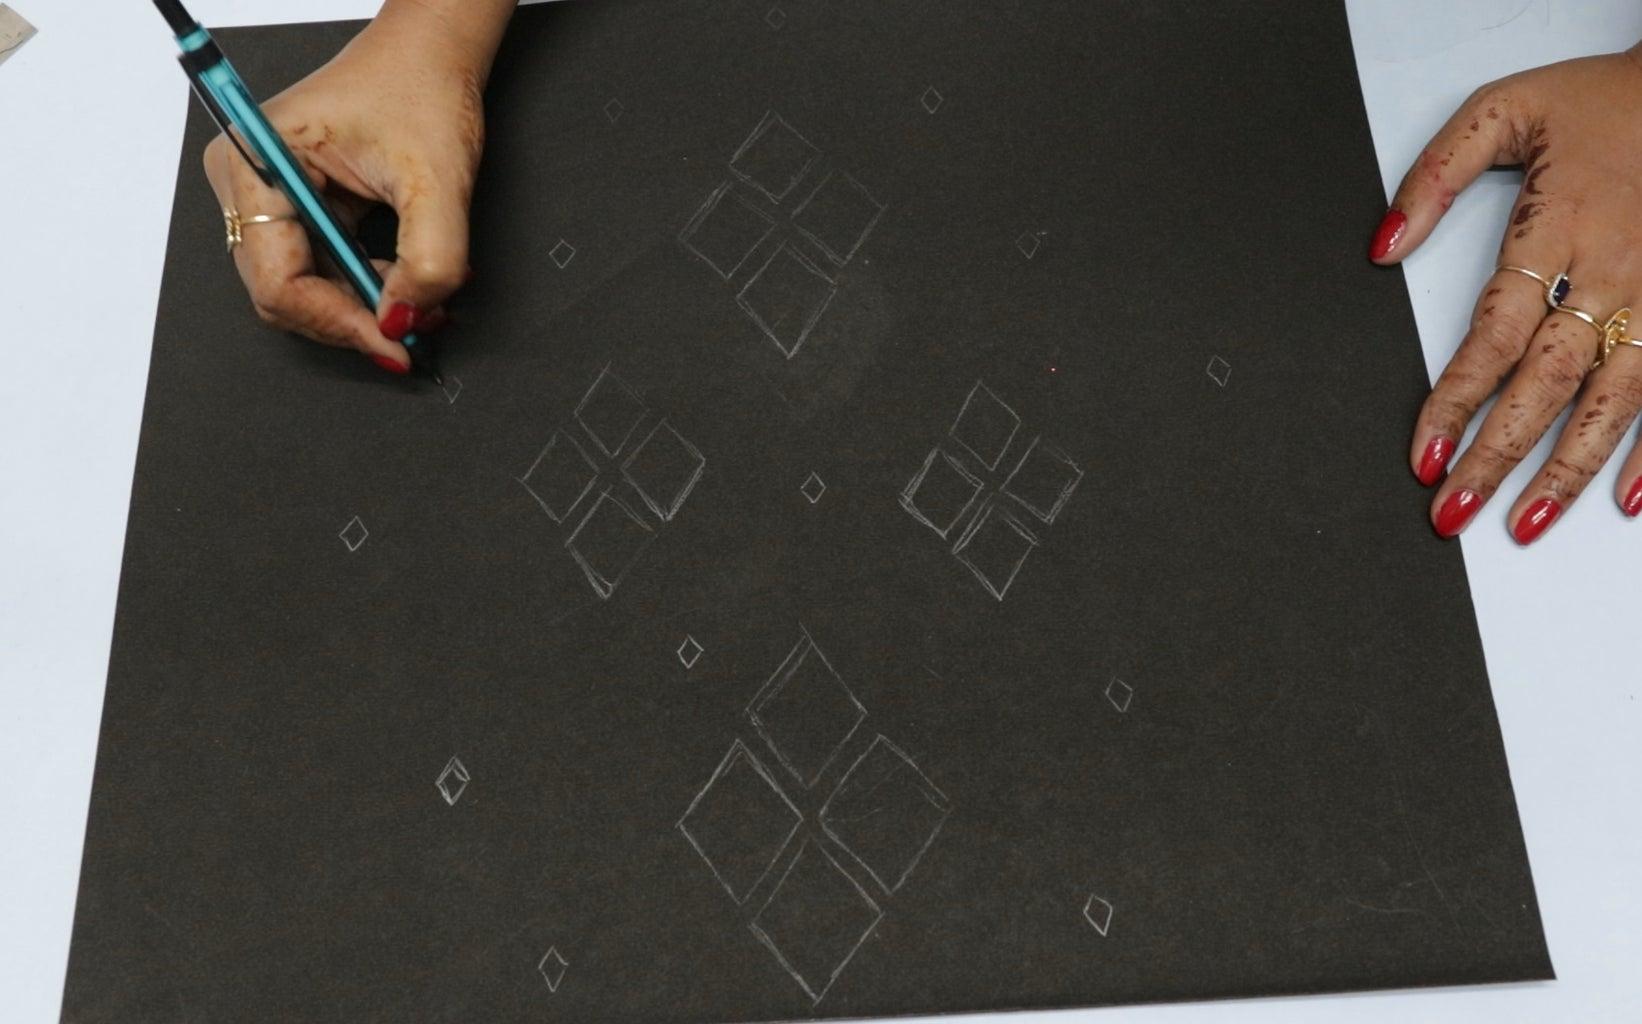 Draw Patterns on Craft Sheet